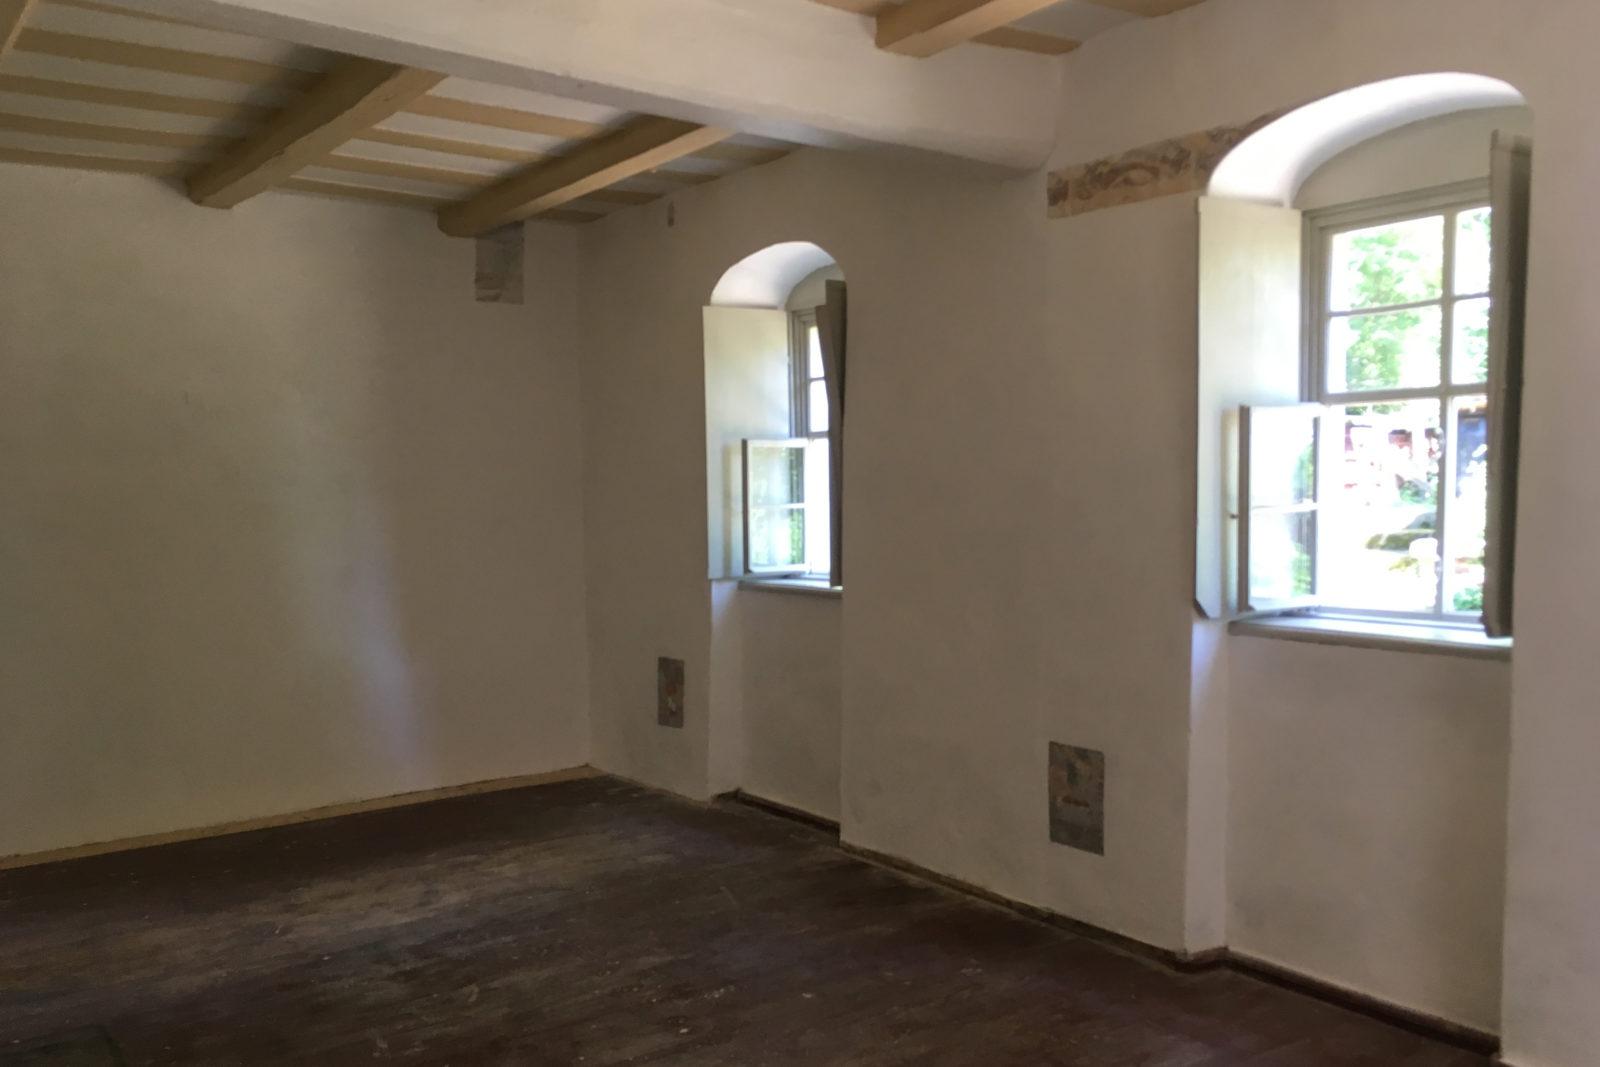 Sanierung Konfirmandenhaus Püchau - Innenraum